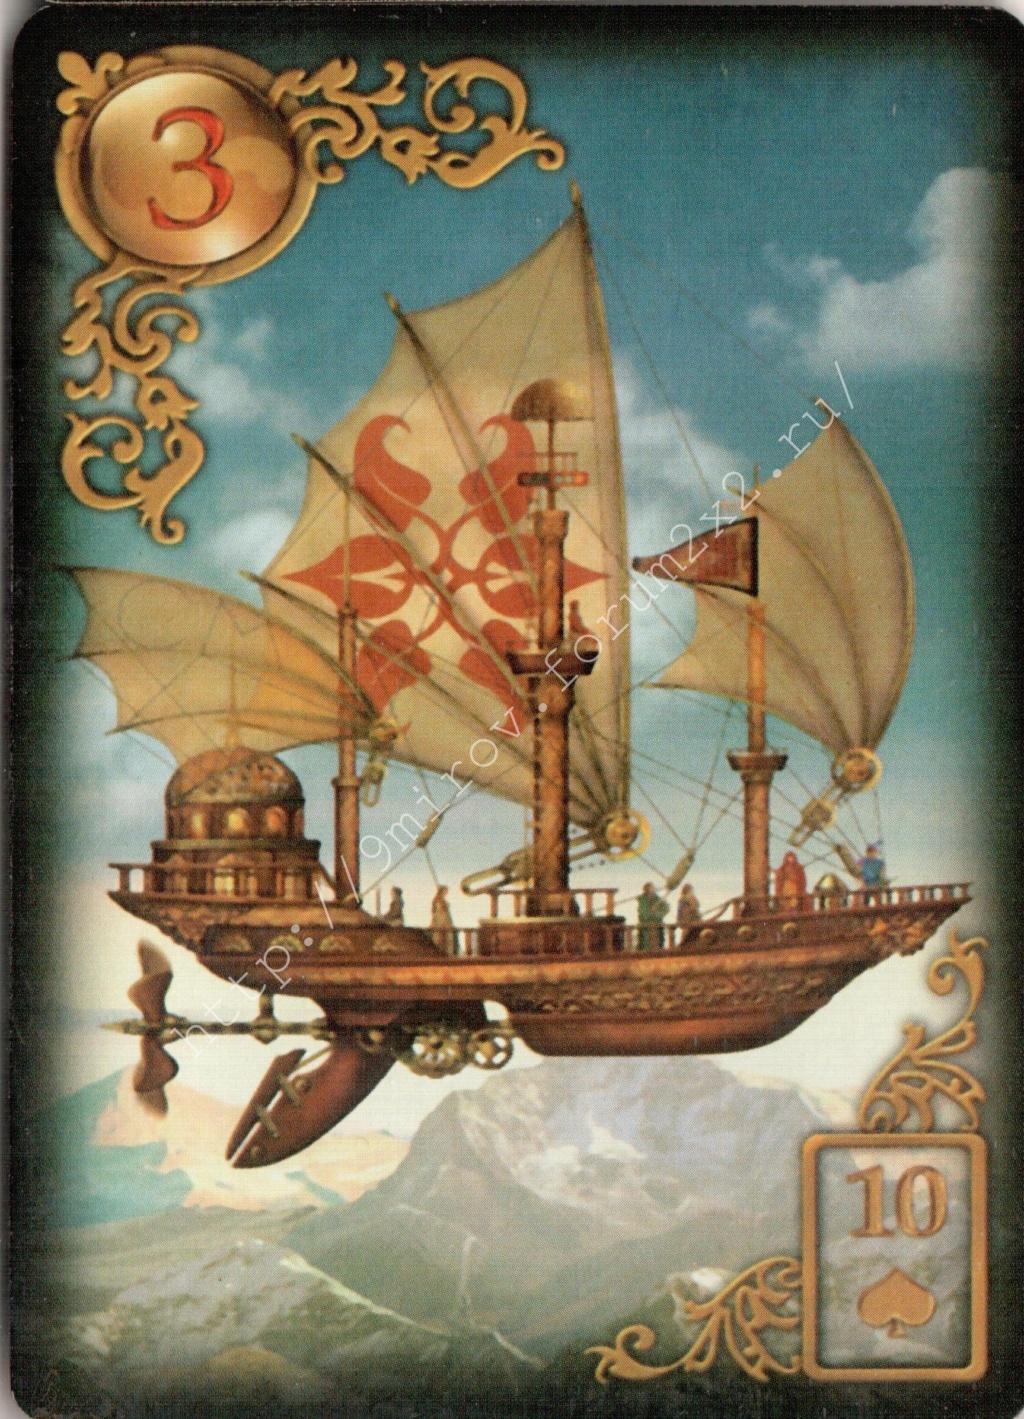 Золотые мечты Ленорман (Расширенное издание) | Gilded Reverie Lenormand. Галерея.  Waterm99